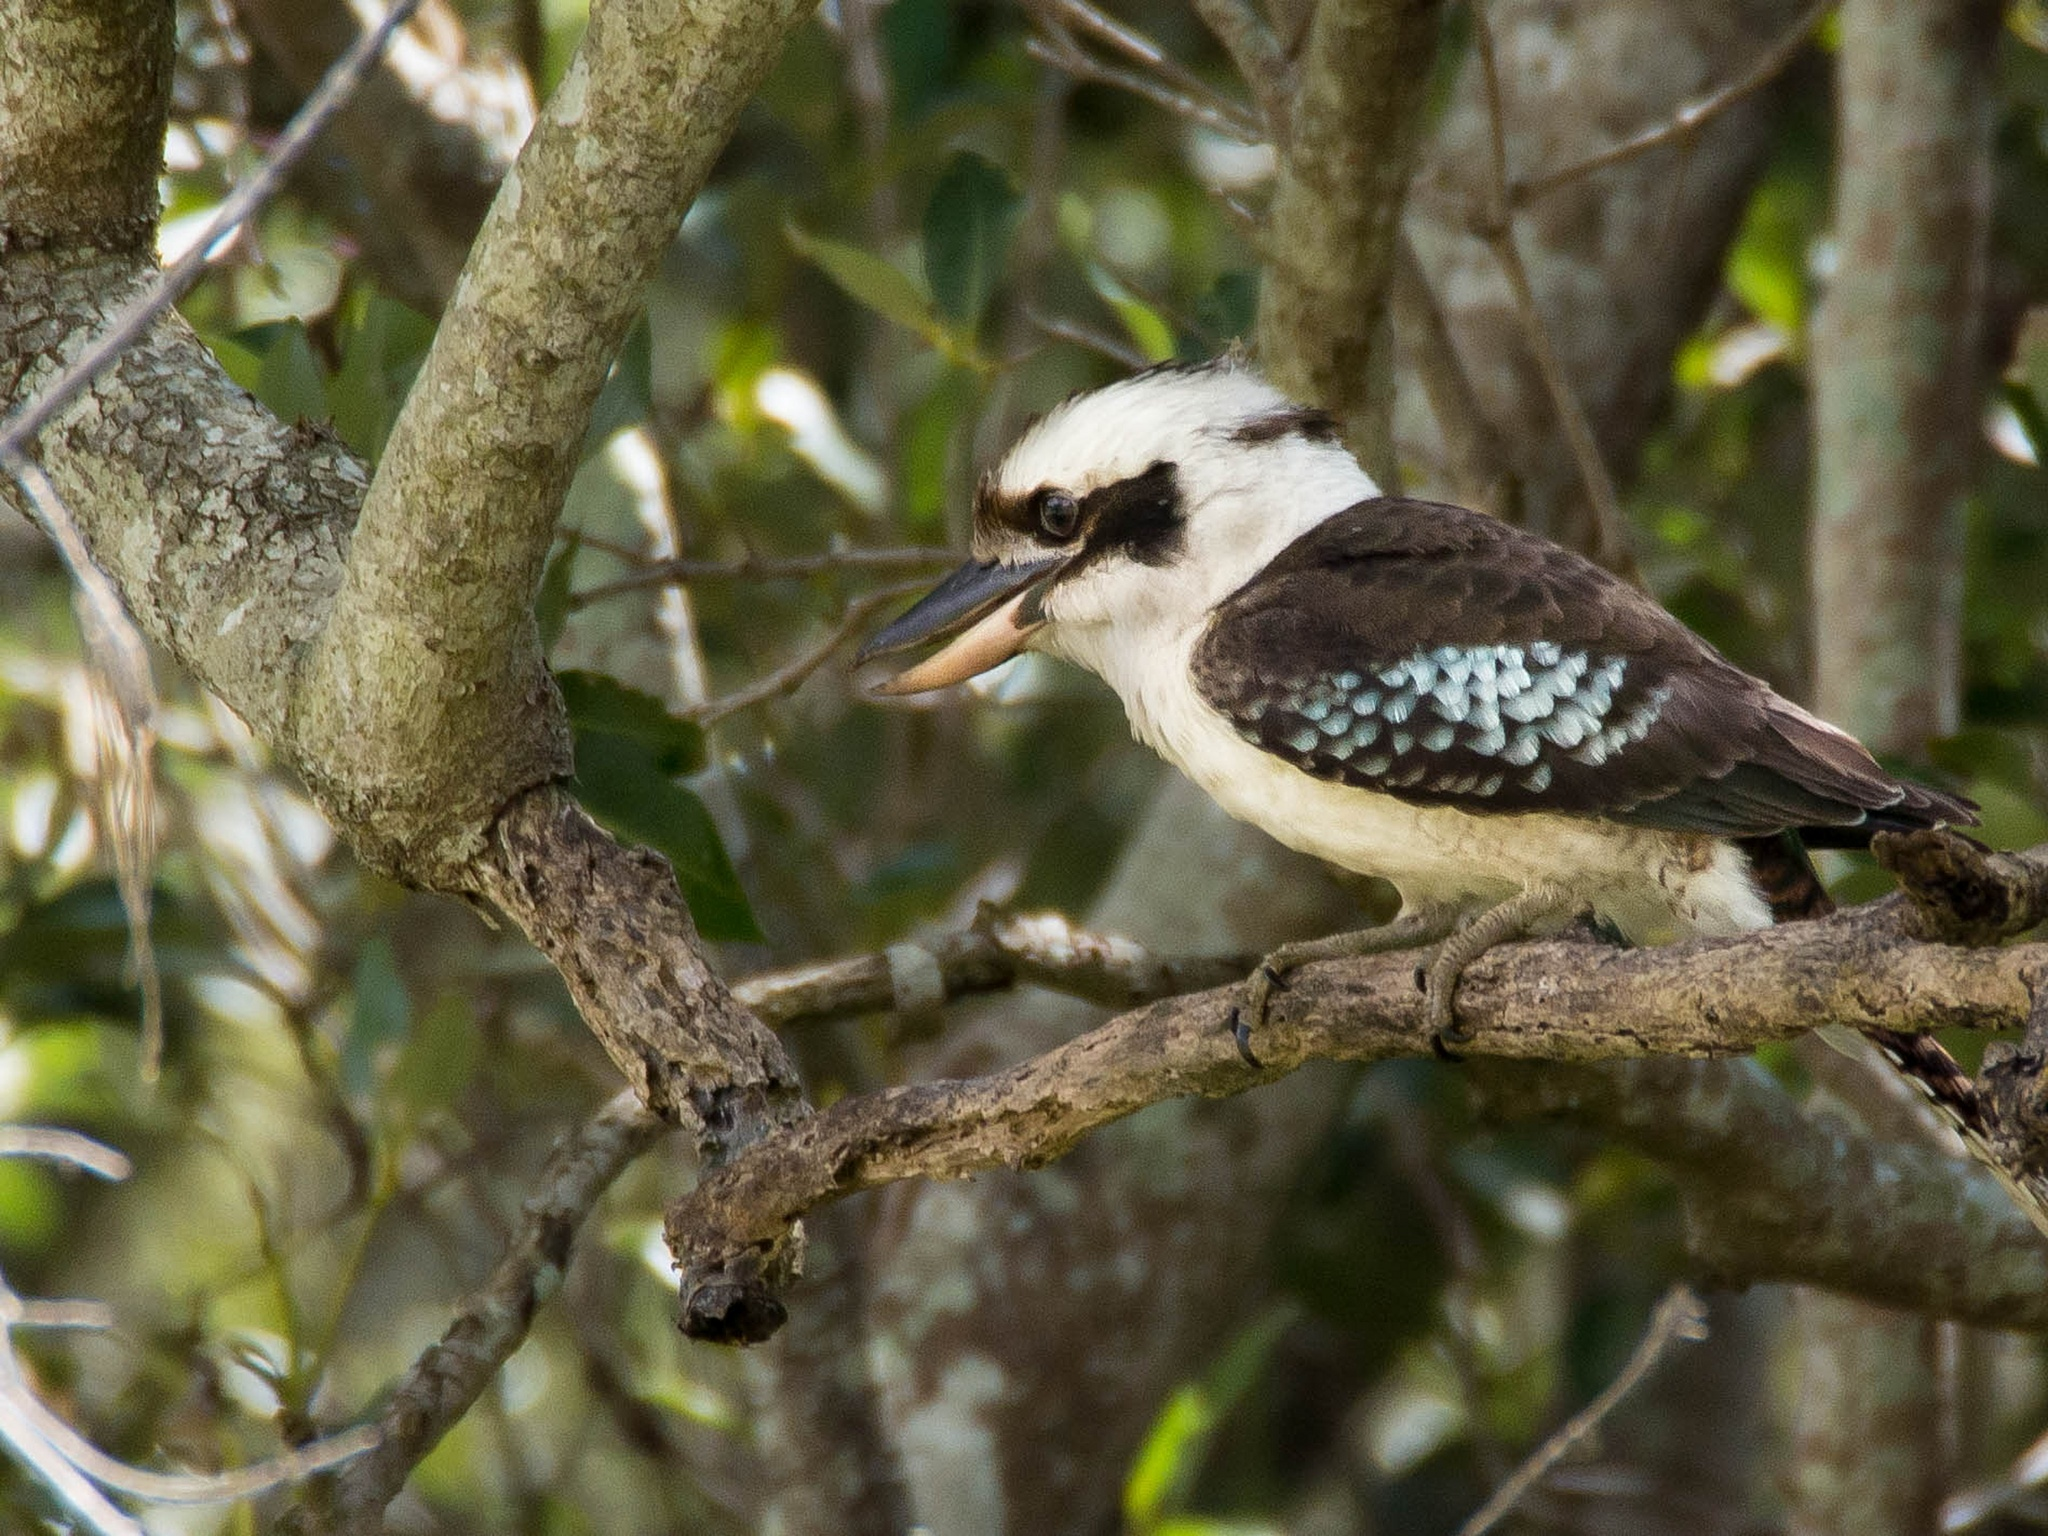 Kookaburra by Kim McGlinchey